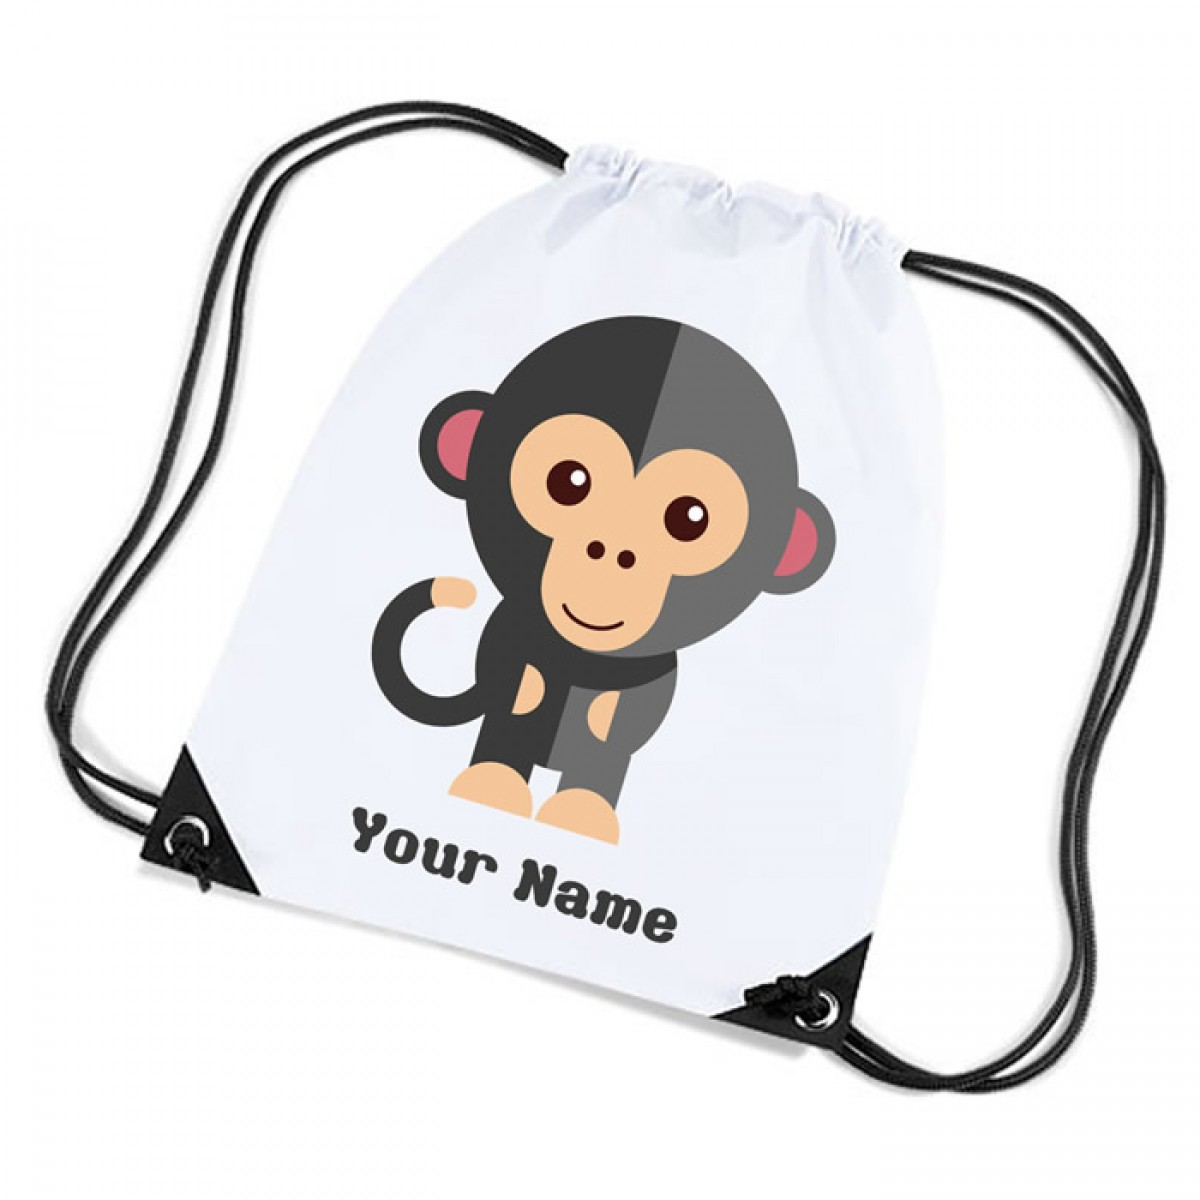 Cartoon Monkey, Personalised Sports Nylon Draw String Gym Sack Pack U0026 Rope  Bag.